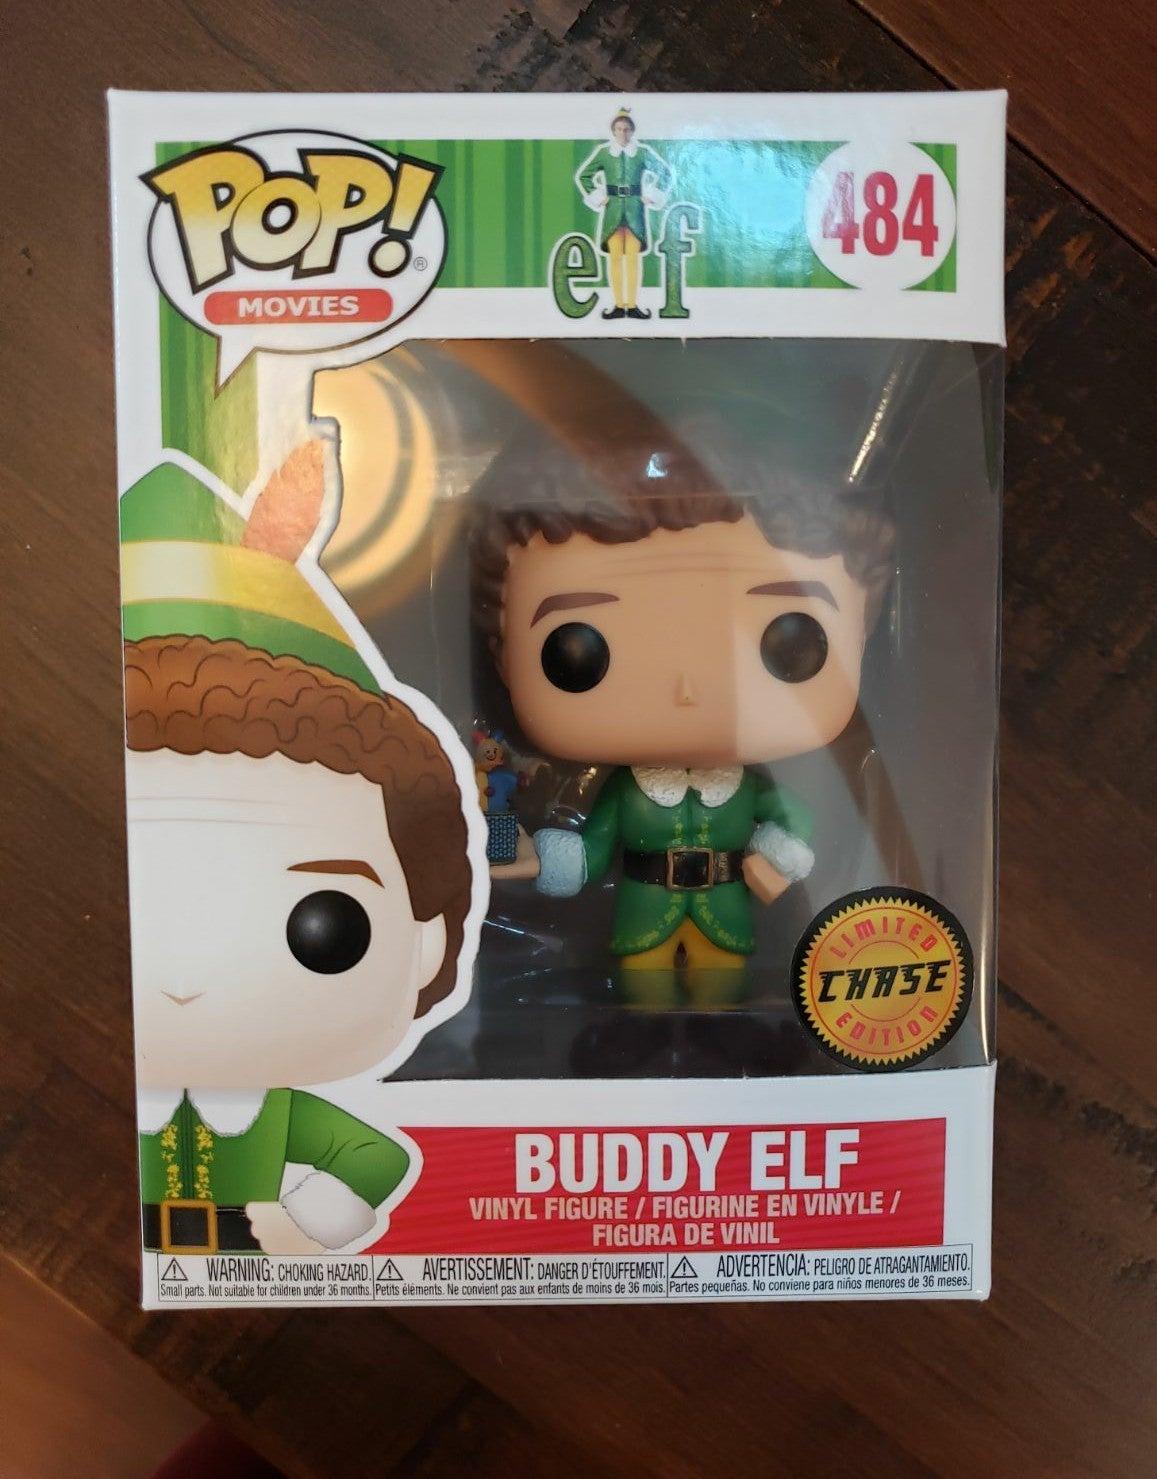 Buddy Elf CHASE 484 funko